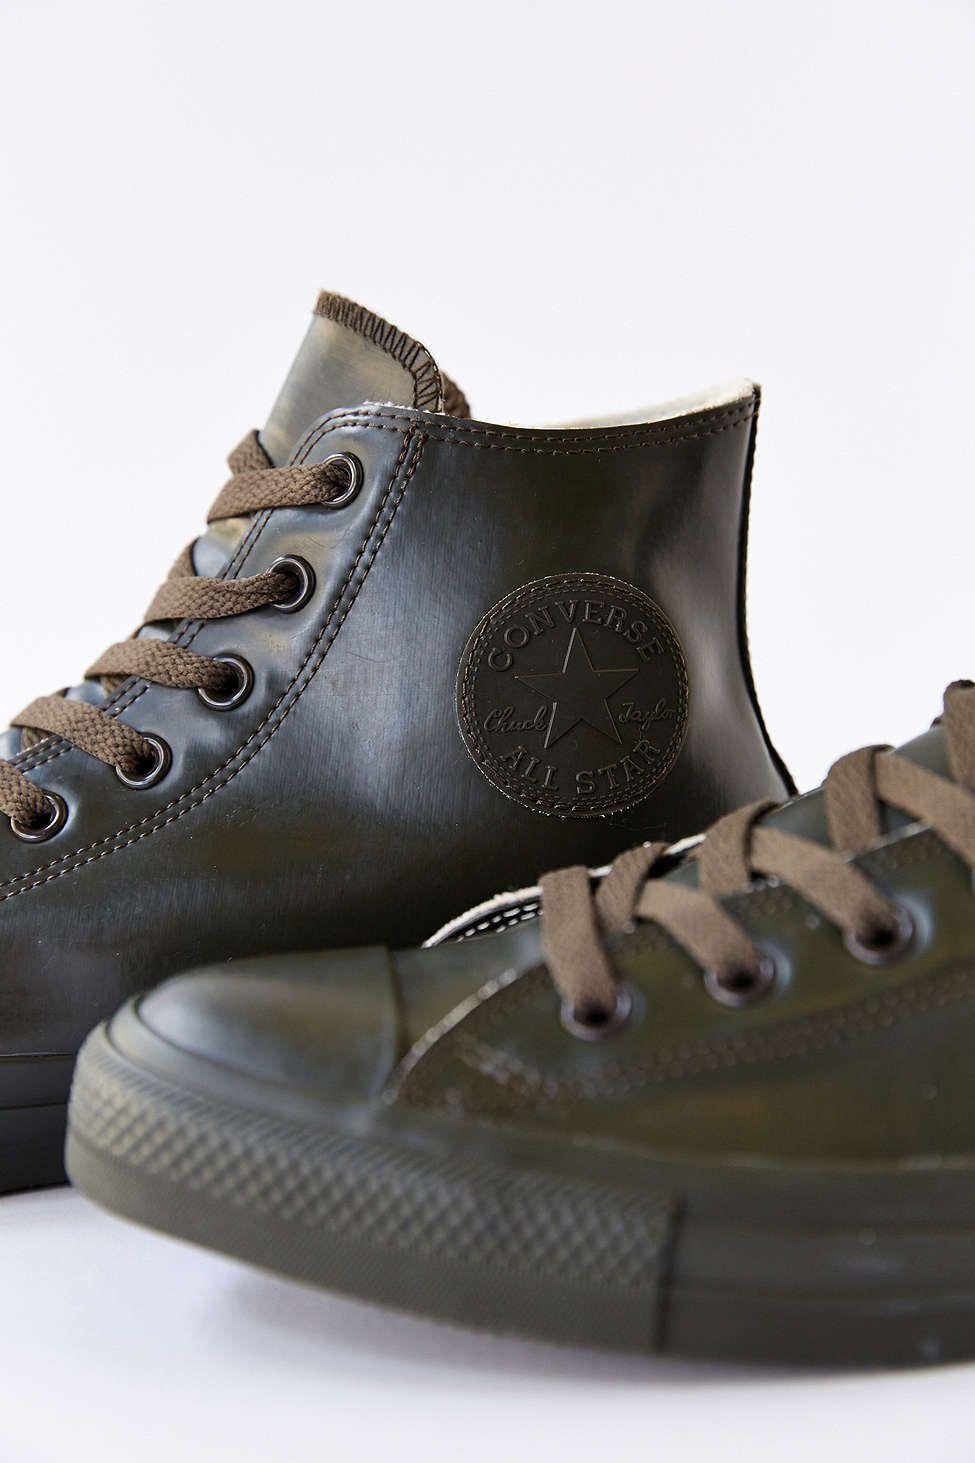 d0a376b0e7ee Size 8 Converse Chuck Taylor All Star Rubber High-Top Men s Sneaker